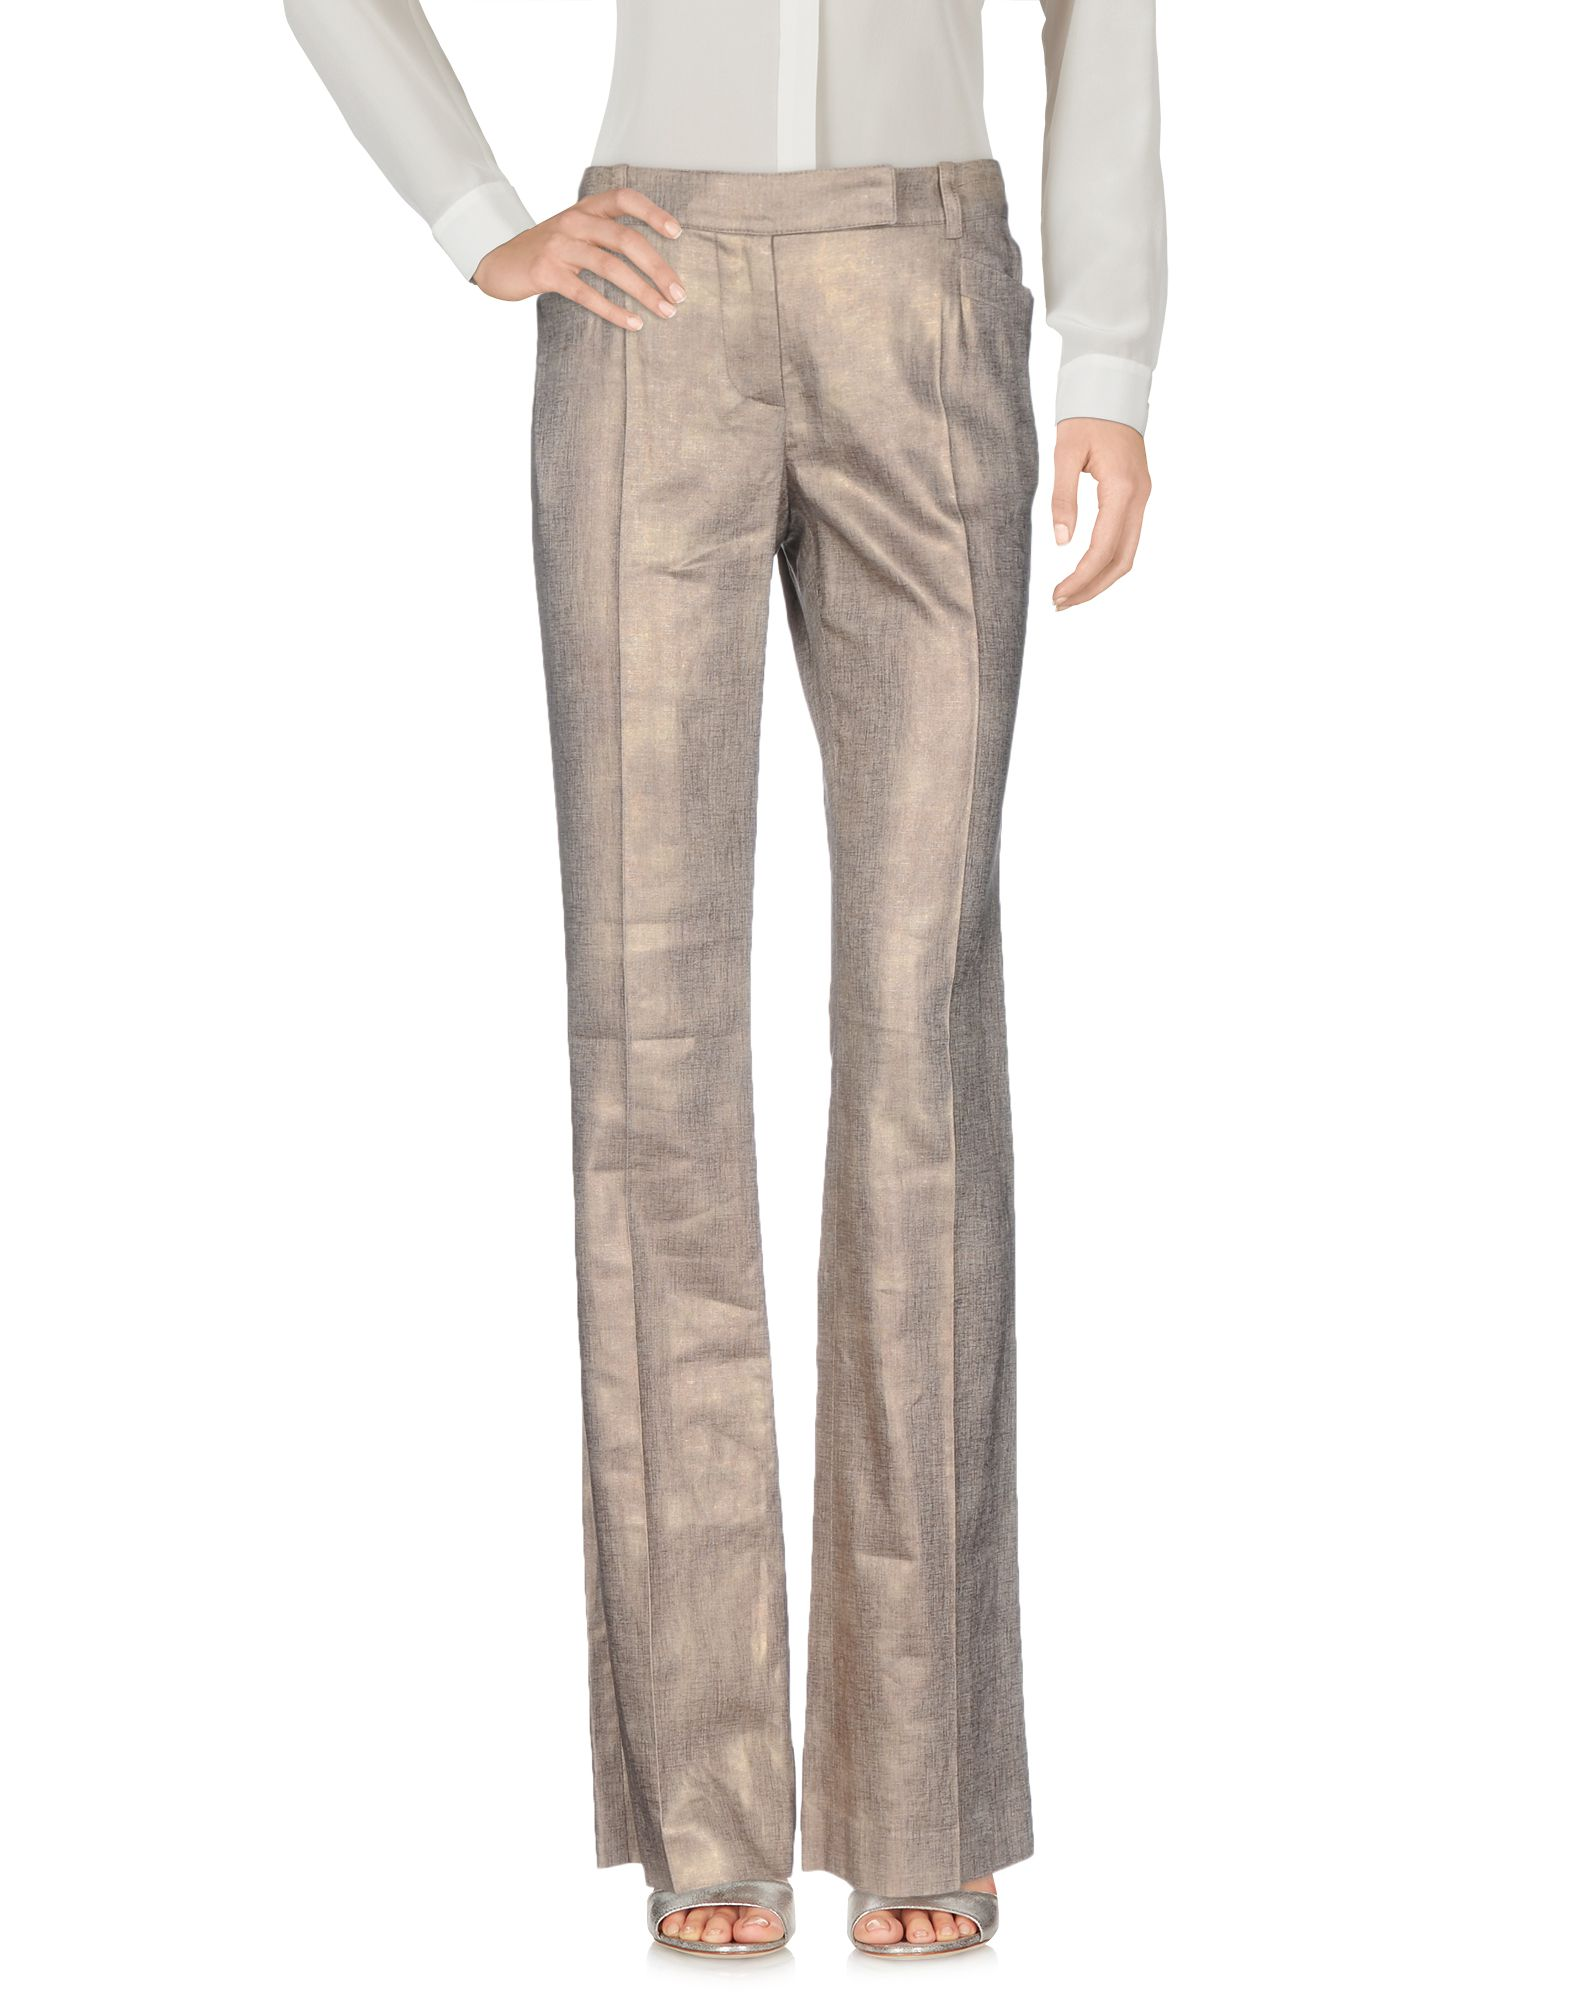 Pantalone John Galliano Donna - Acquista online su 0FvEPBpJci